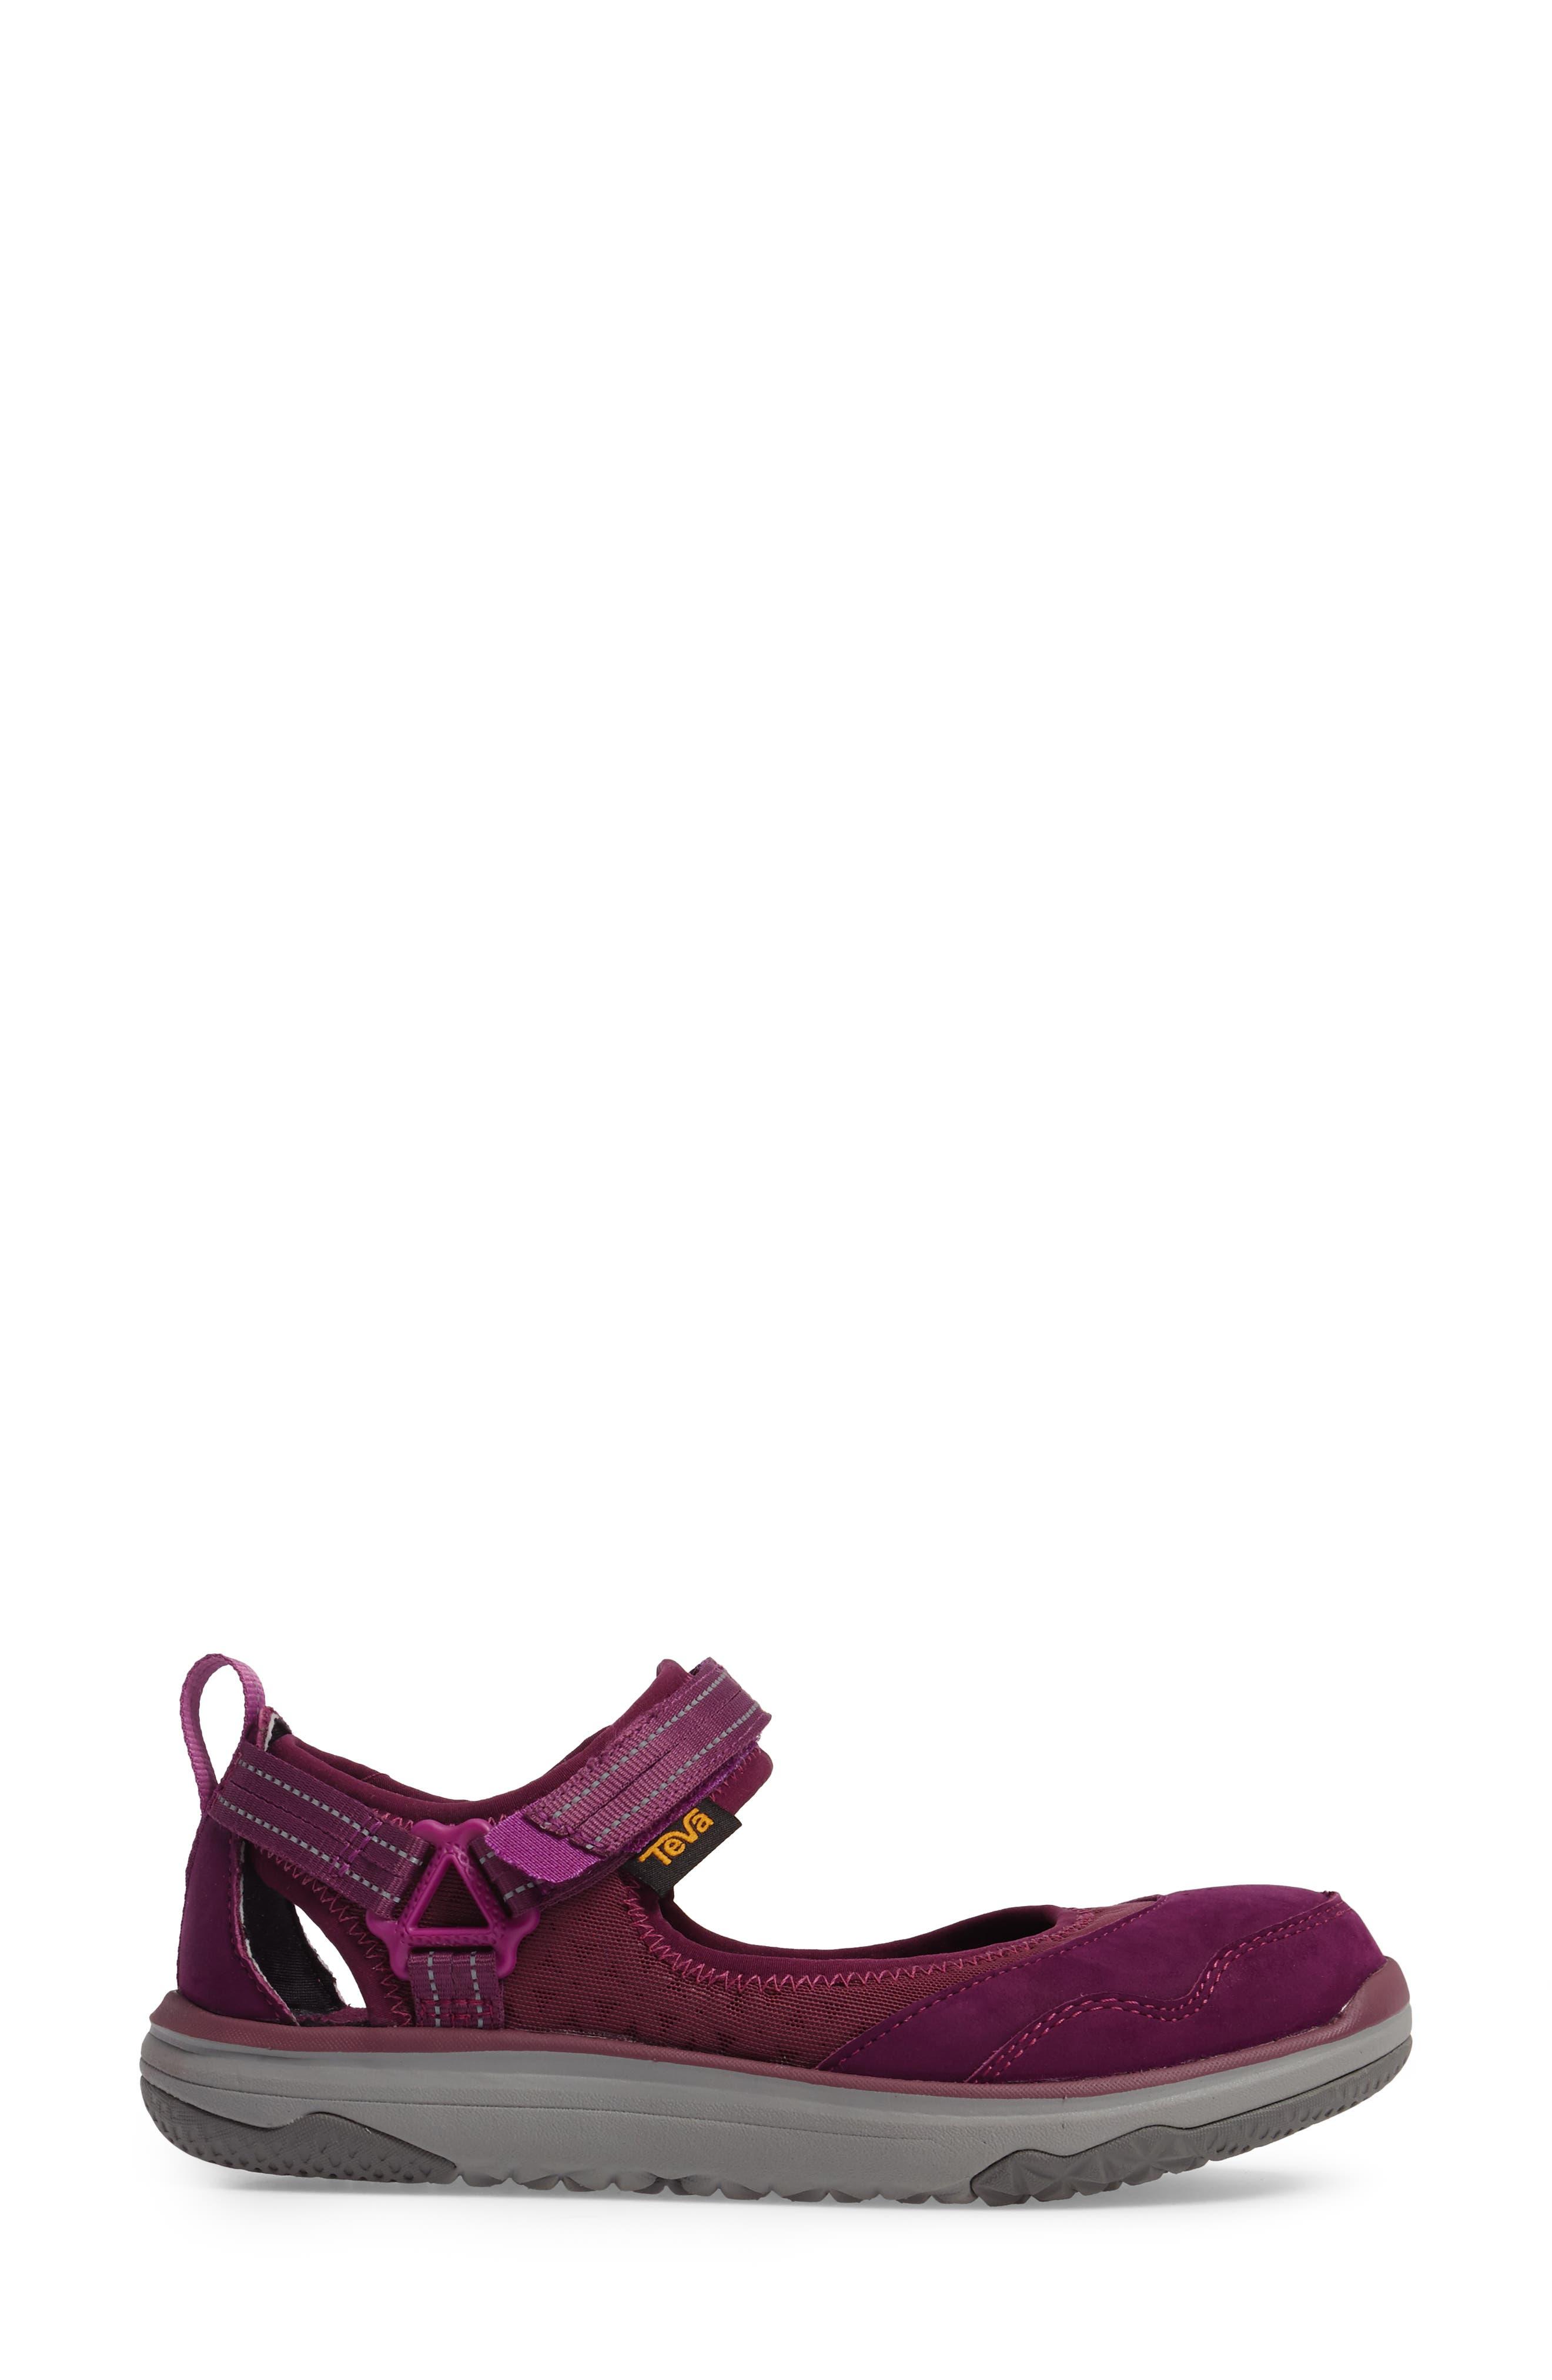 Terra Float Travel Mary Jane Flat,                             Alternate thumbnail 3, color,                             Dark Purple Leather